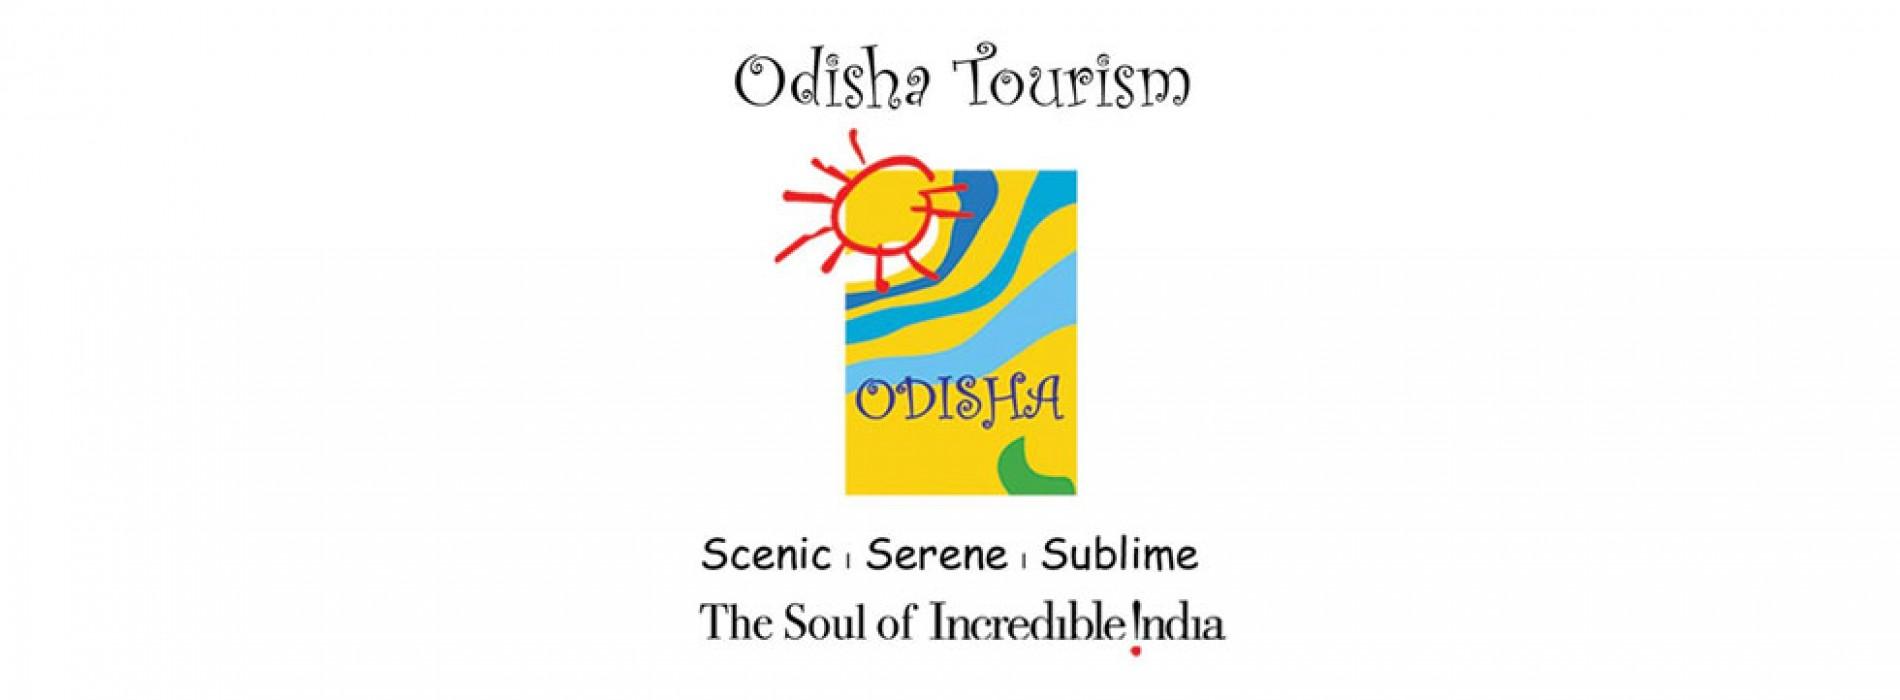 Odisha Tourism Road Show held at Mumbai to attract Domestic Tourists